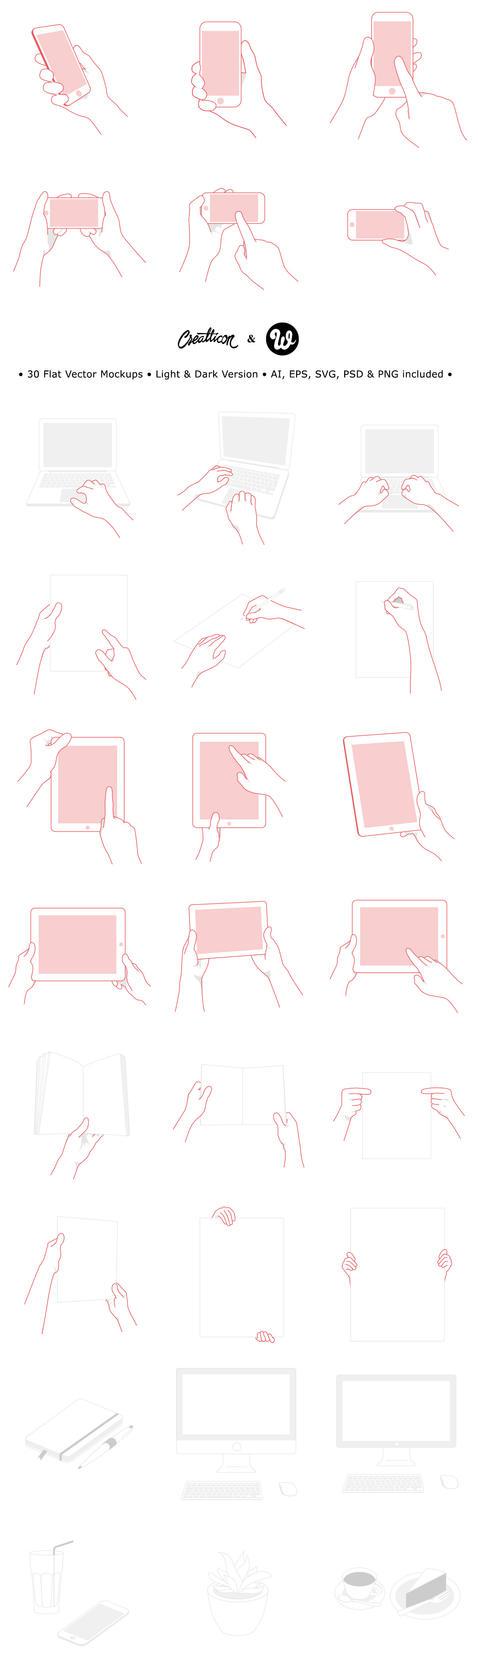 FREEBIE: 60 Flat Mockups on Webdesigner Depot by creatticon